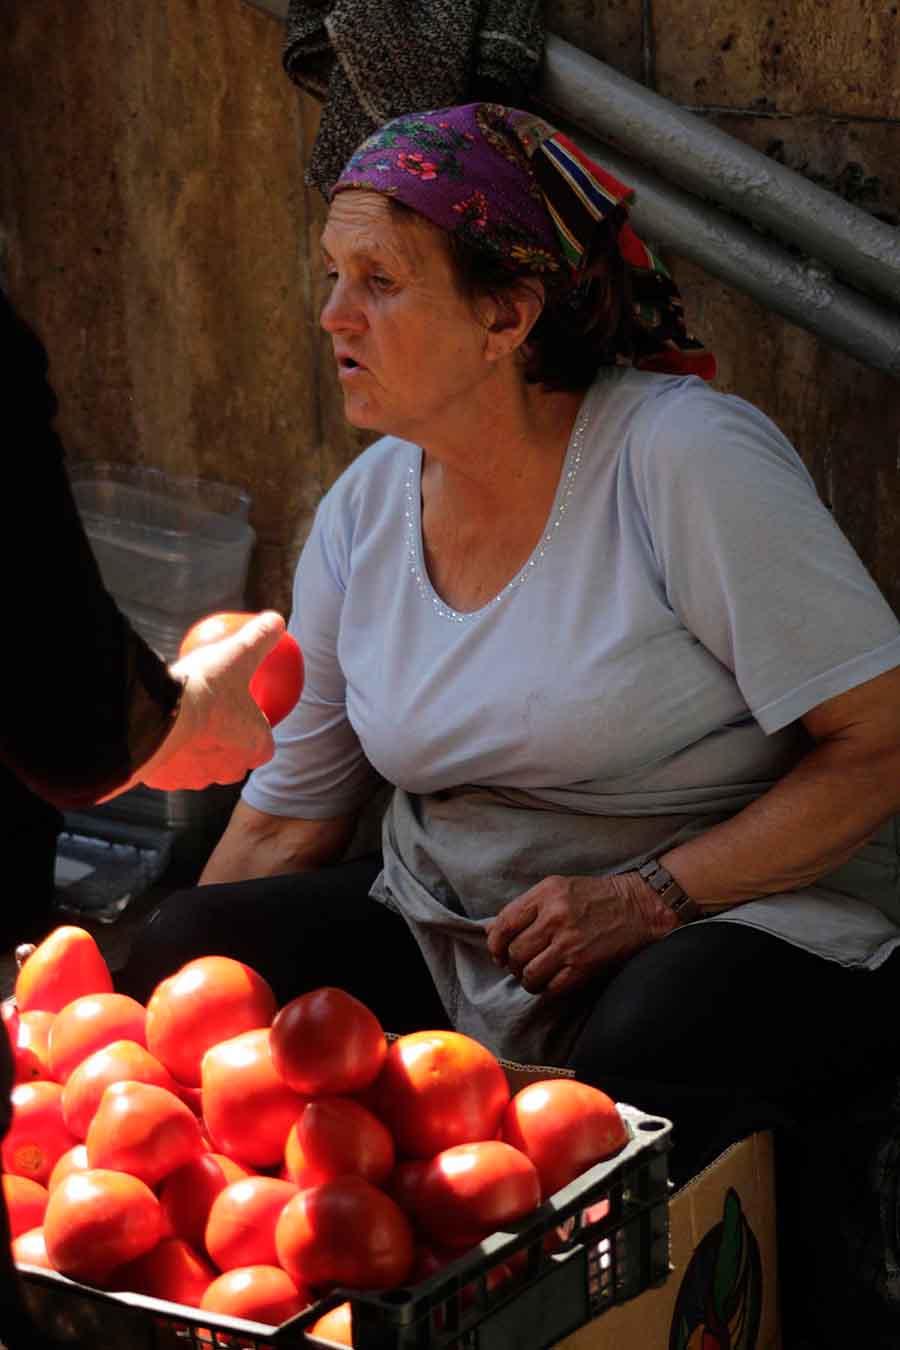 Tomato Seller, Kiev - Photographs by Gavin Cologne-Brookes